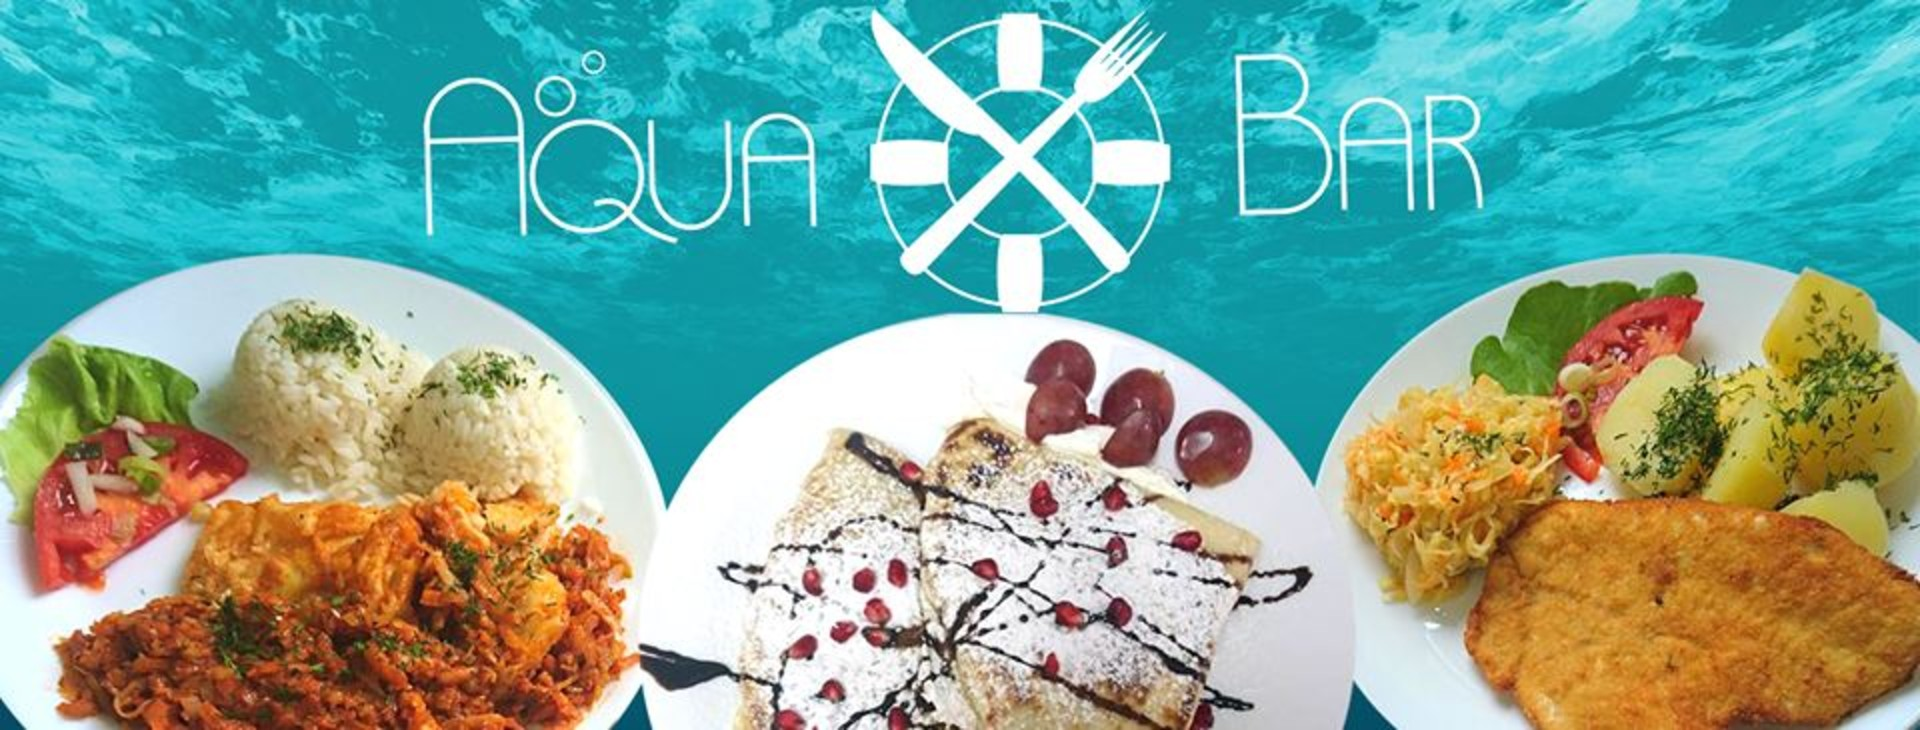 Aqua – Bar już czynny